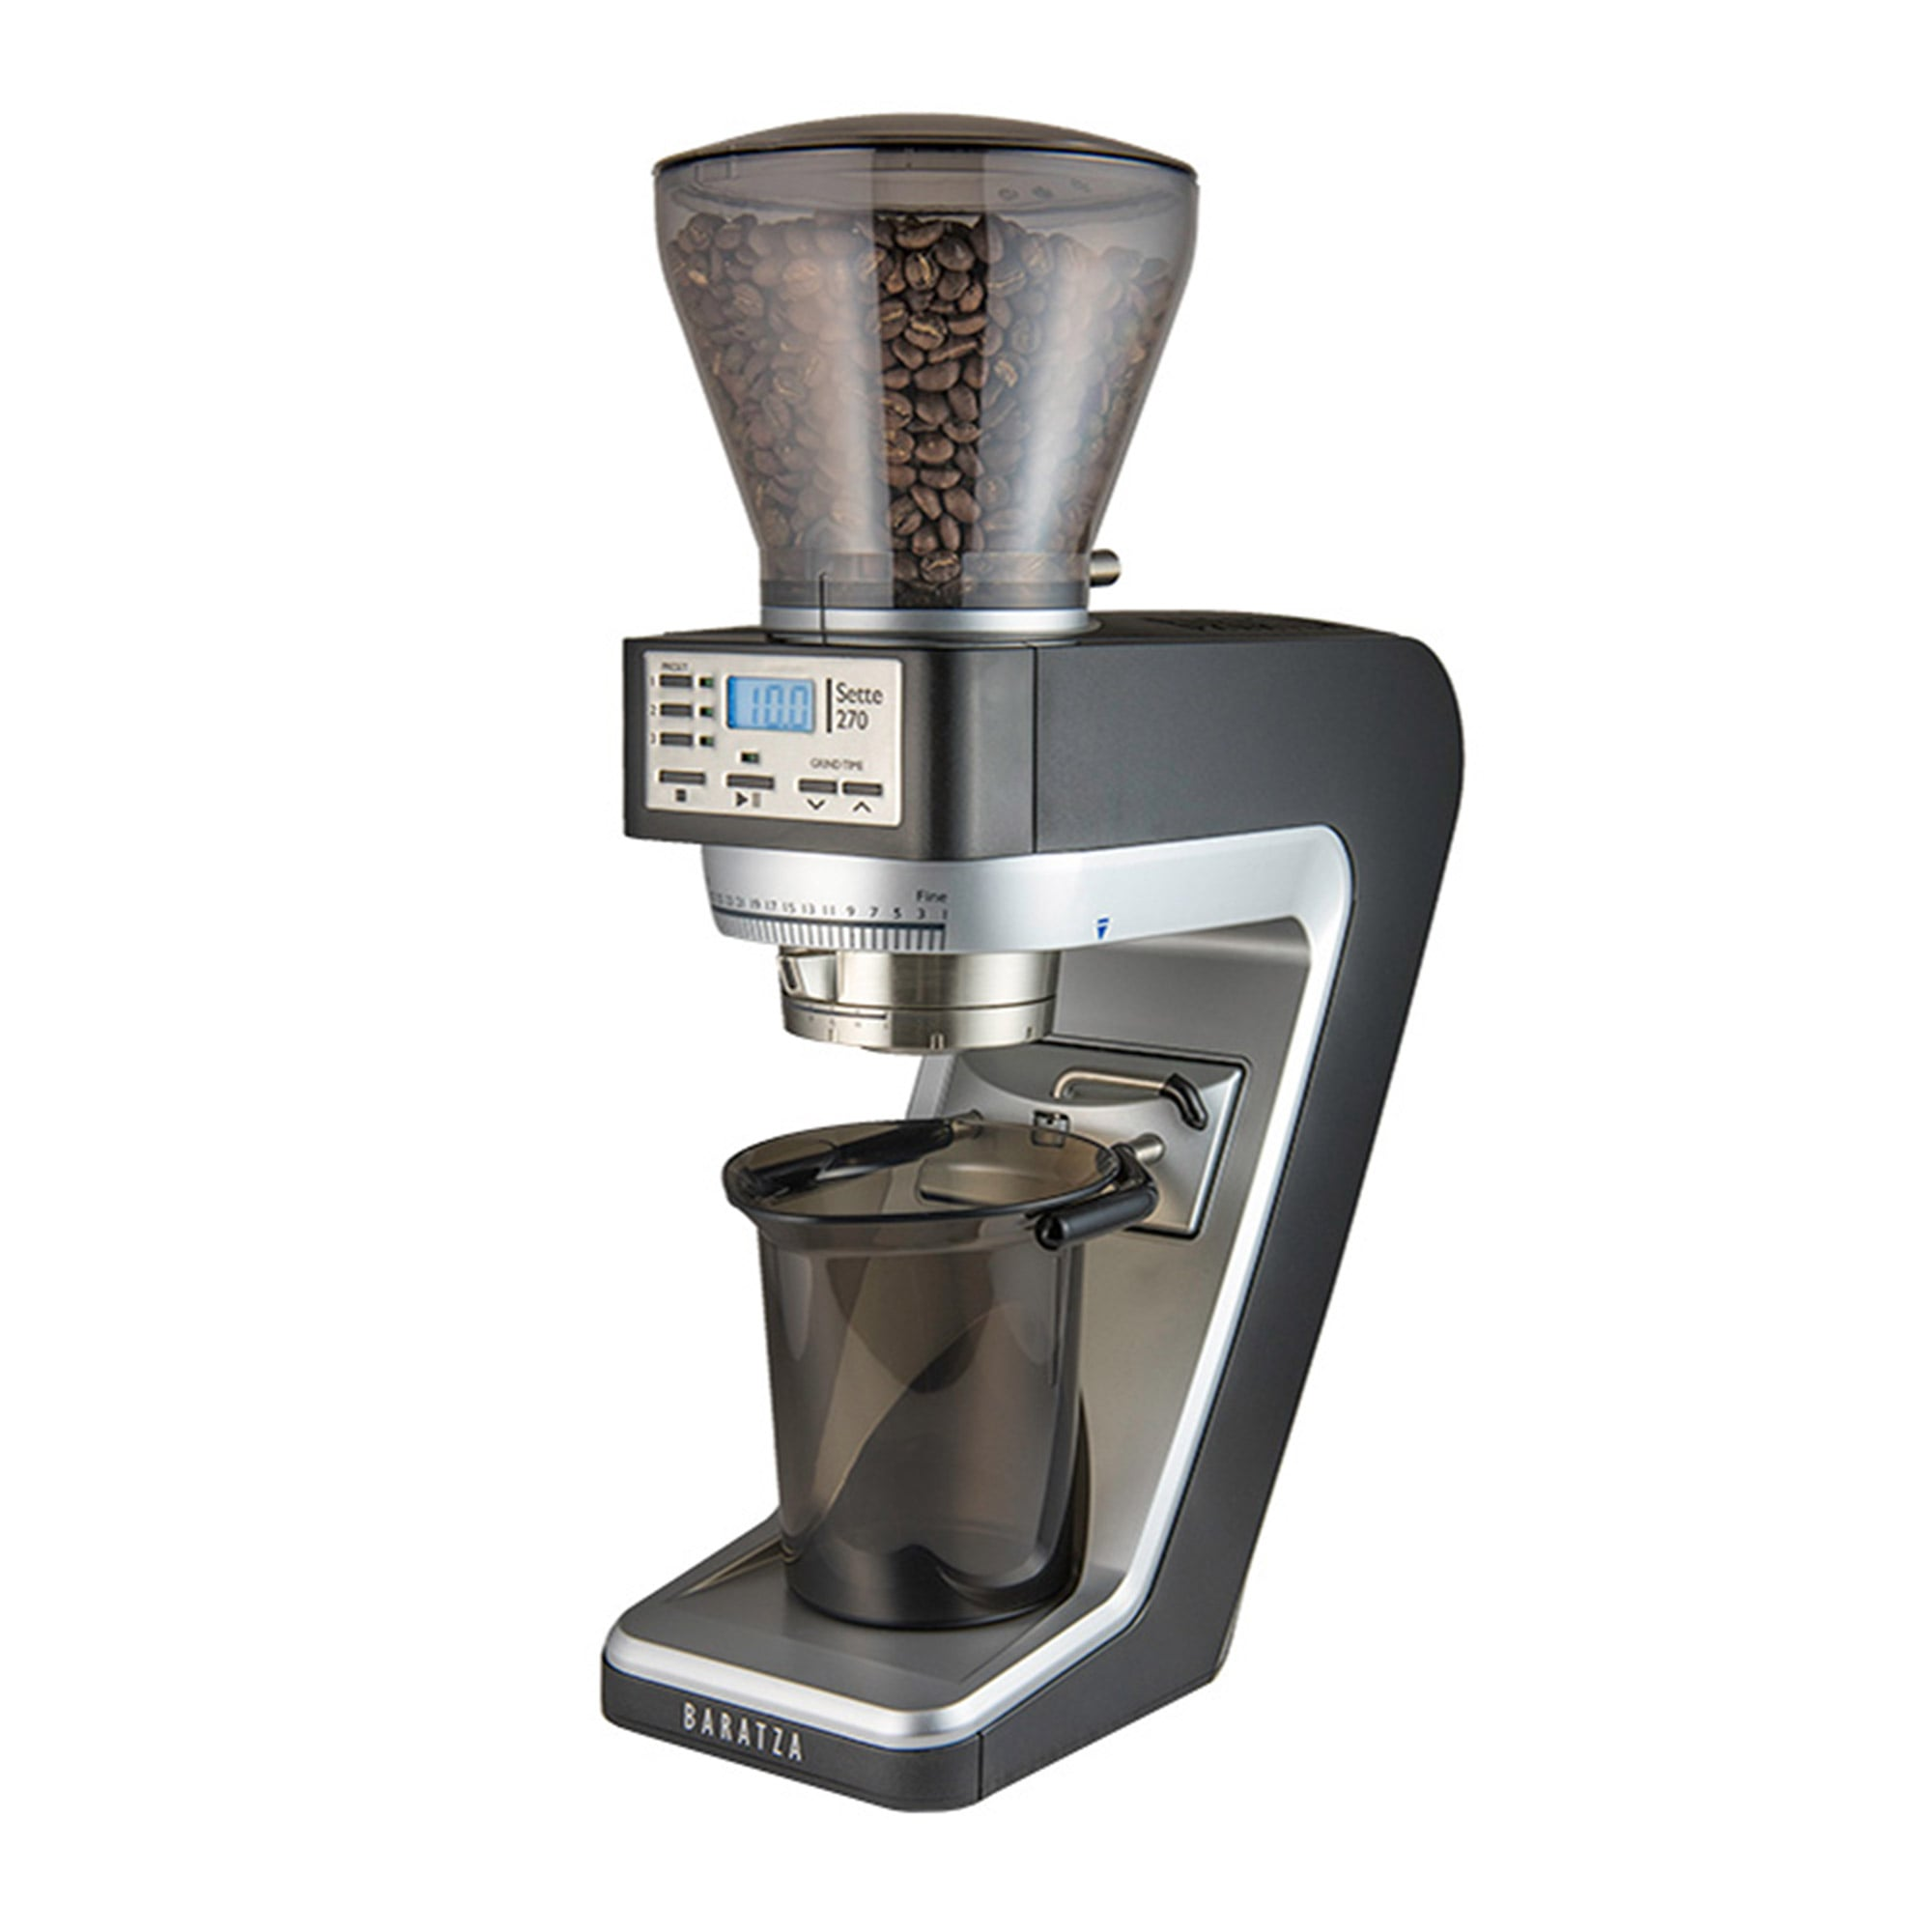 baratza sette 270 kaffeem hle online kaufen coffee circle. Black Bedroom Furniture Sets. Home Design Ideas